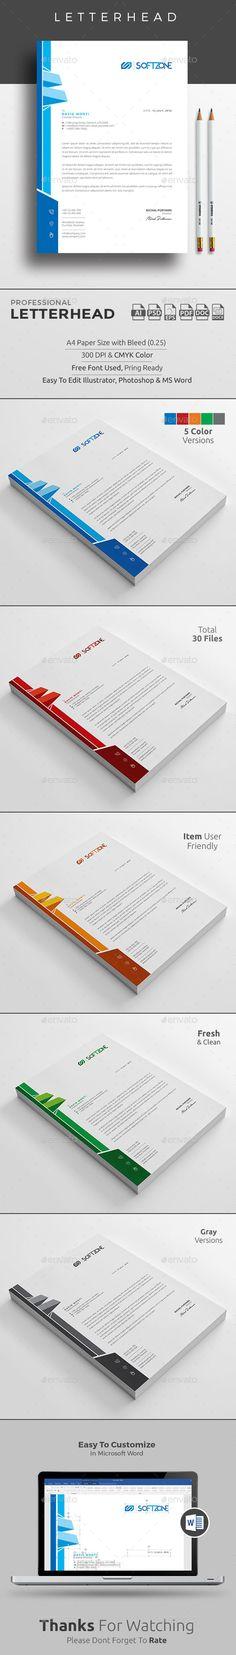 Letterhead Templates PSD, MS Word Bundle Letterhead Design - corporate letterhead template